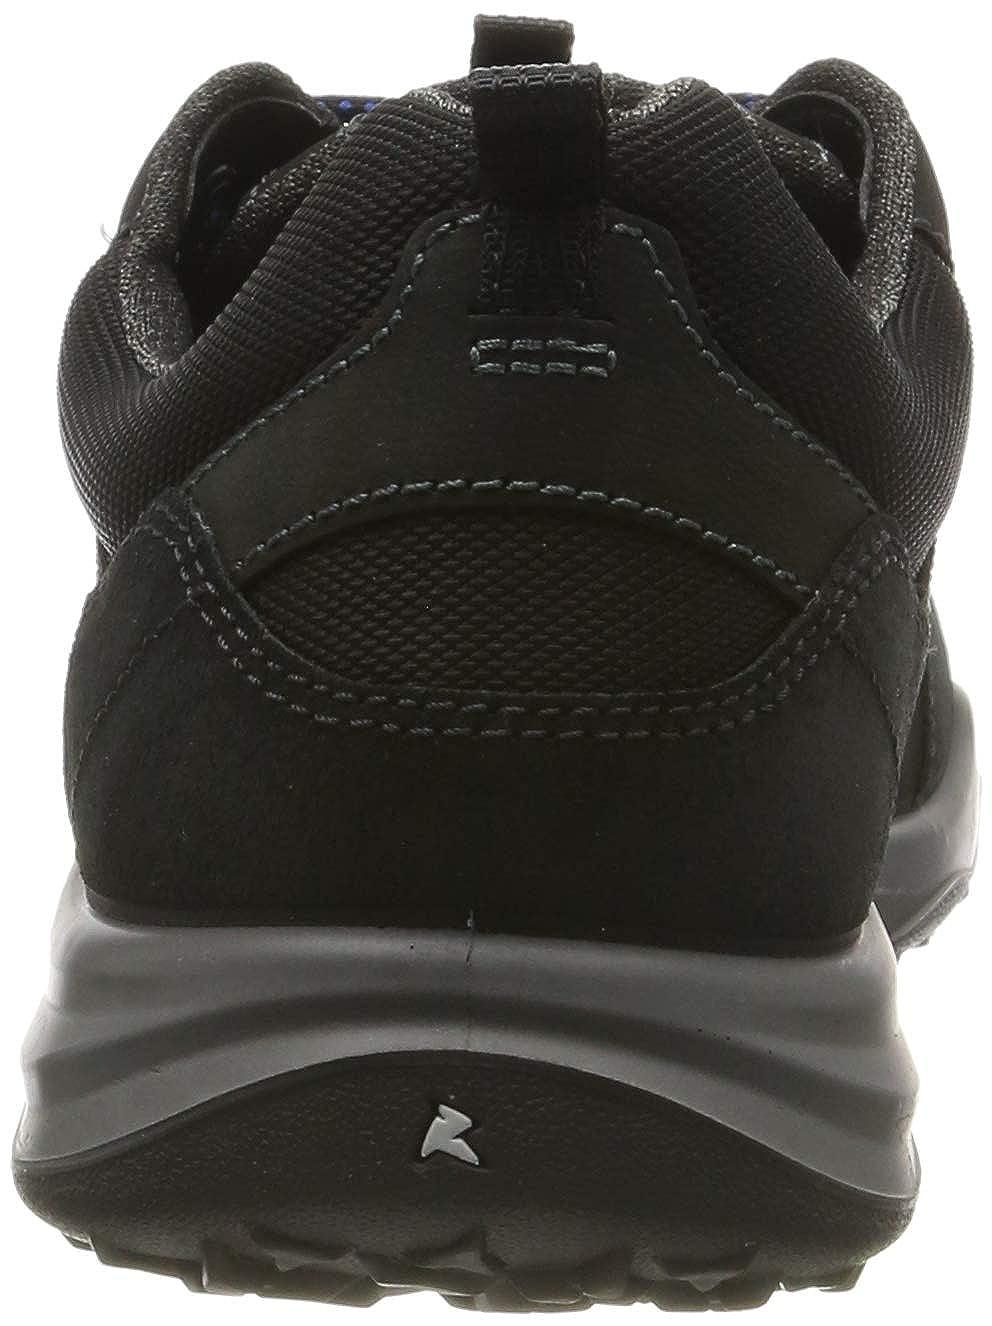 ECCO Espinho Chaussures Multisport Outdoor Homme